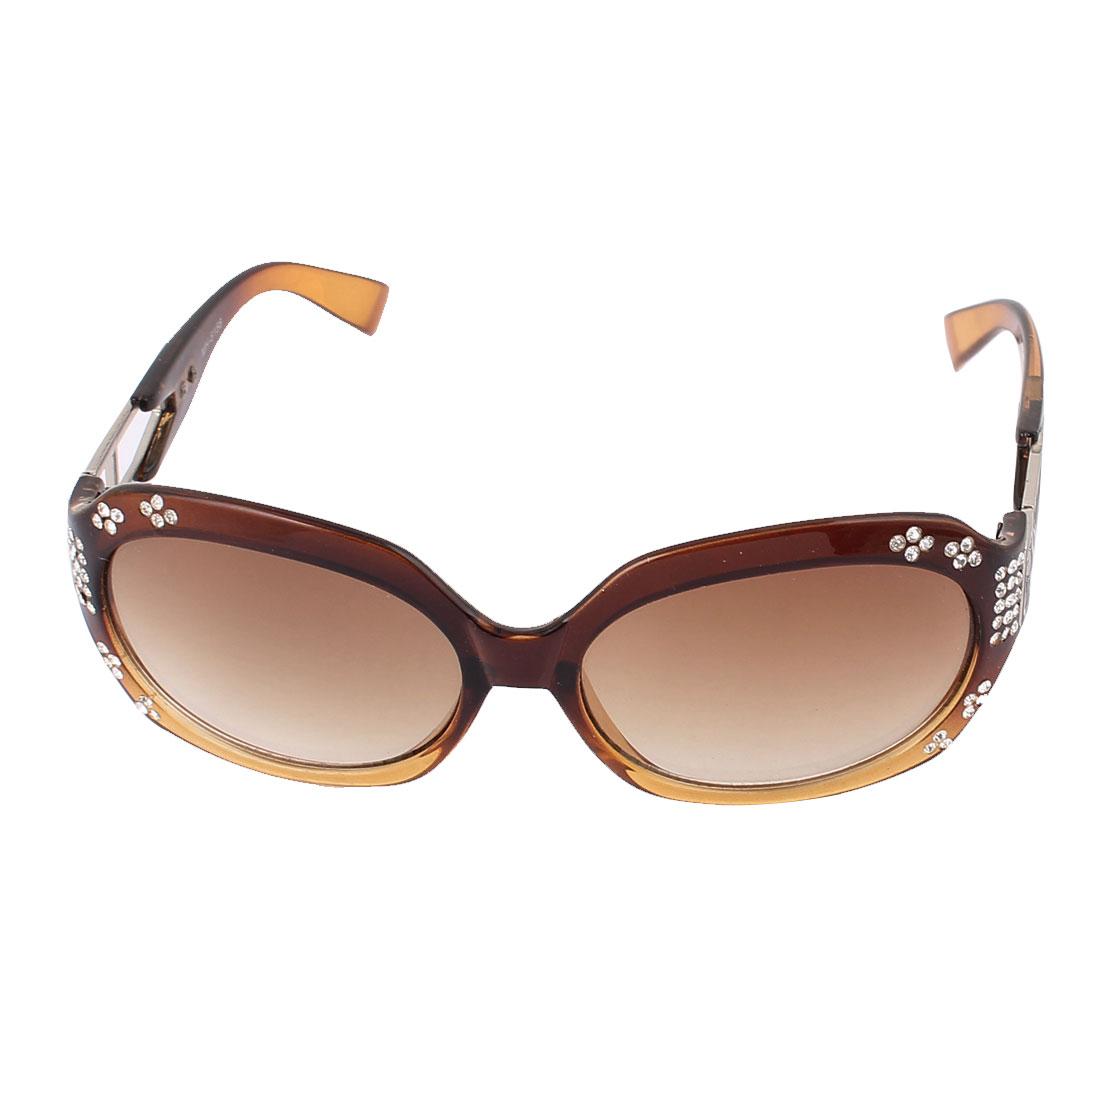 Lady Full Rim Single Bridge Light Brown Lens Eyeglasses Sunglasses